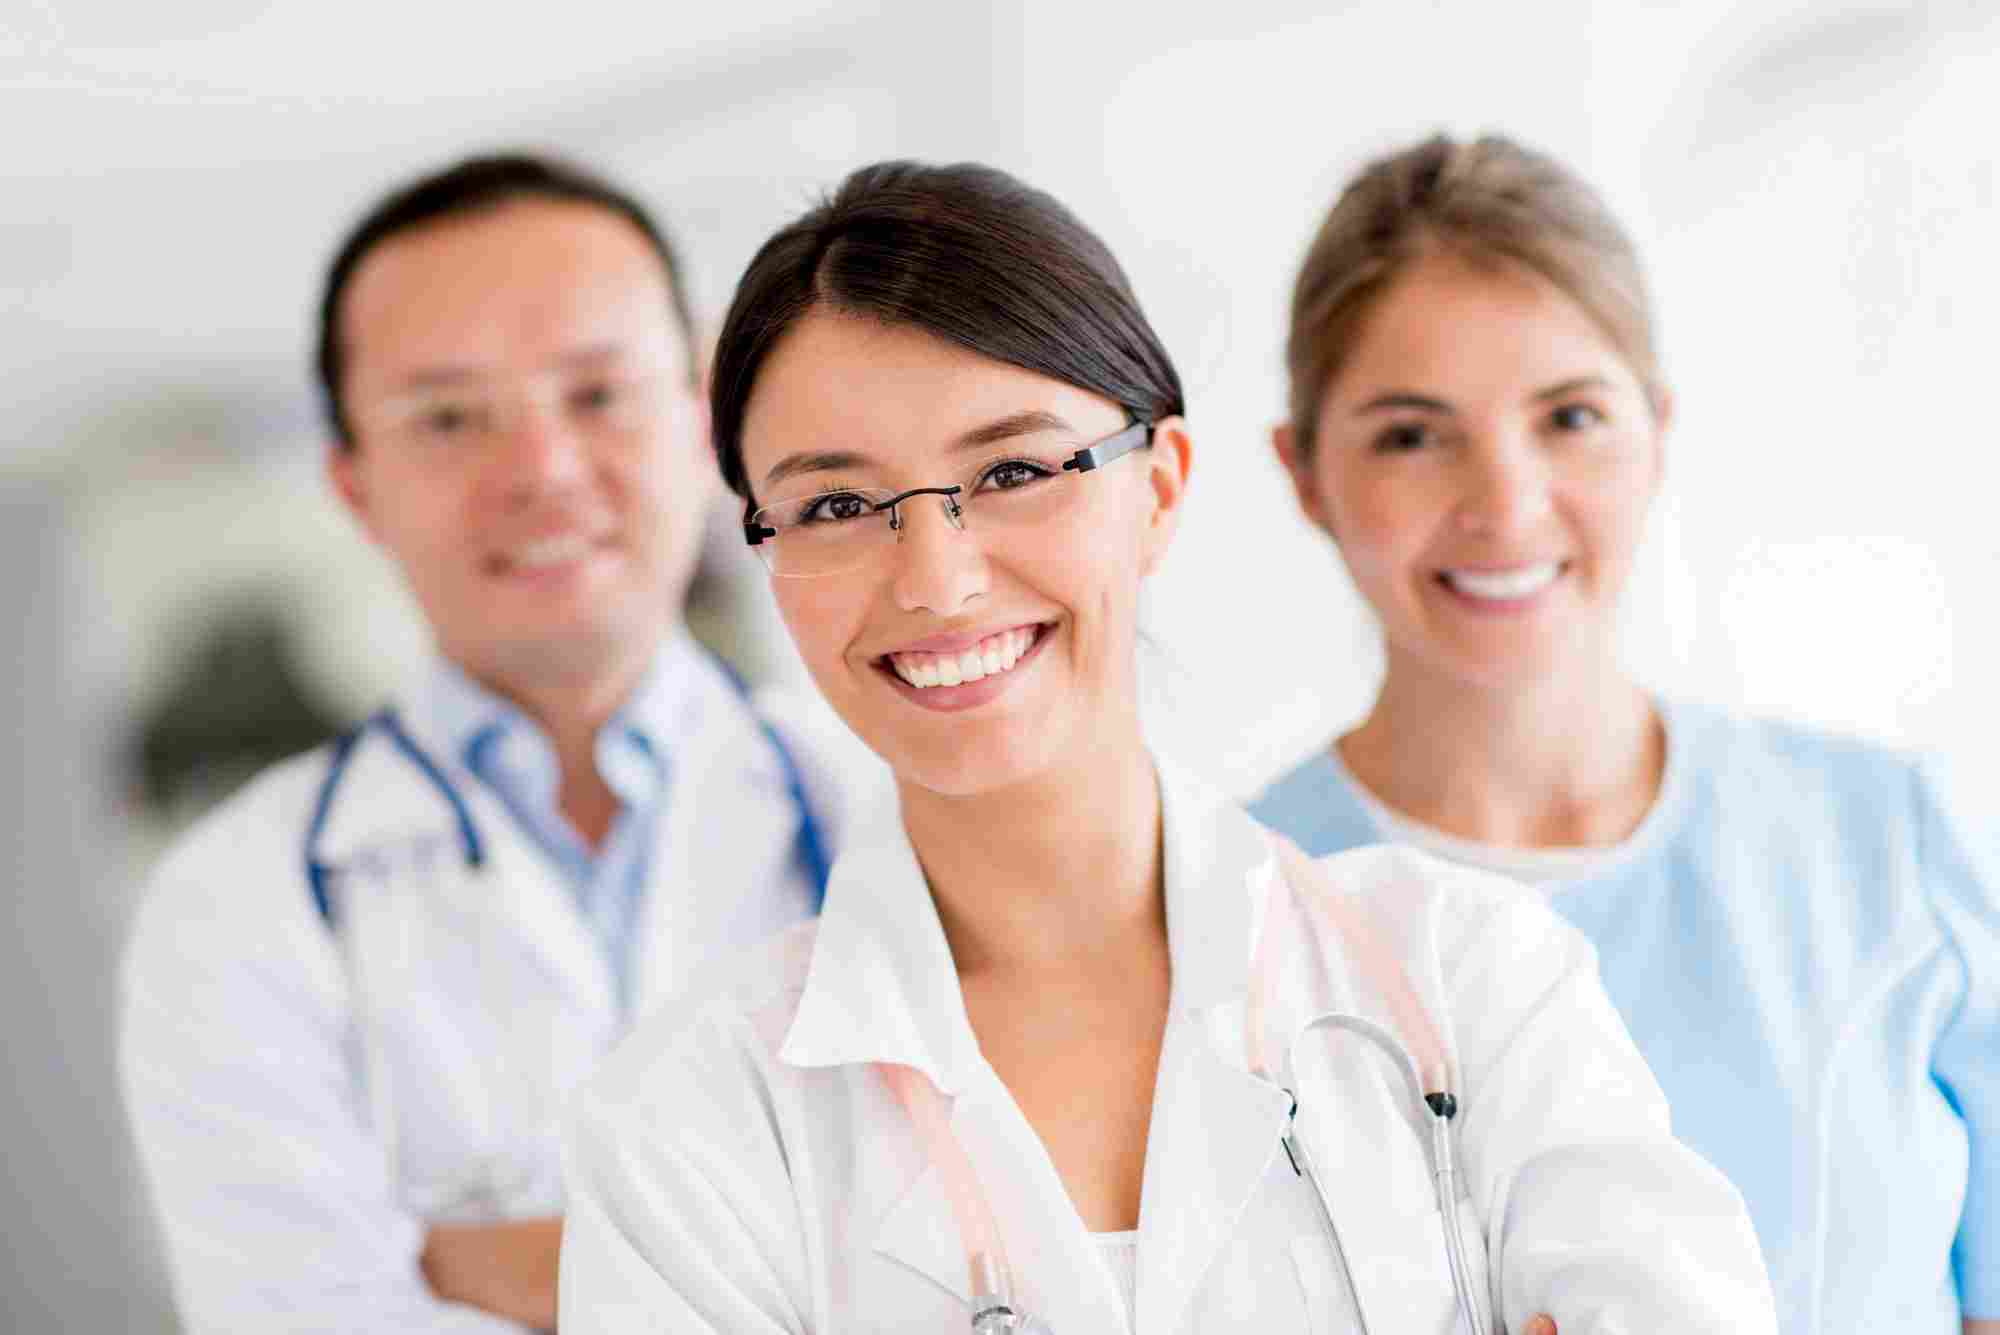 http://www.chiropracteur-plaisance.fr/wp-content/uploads/2015/12/doctors.jpg